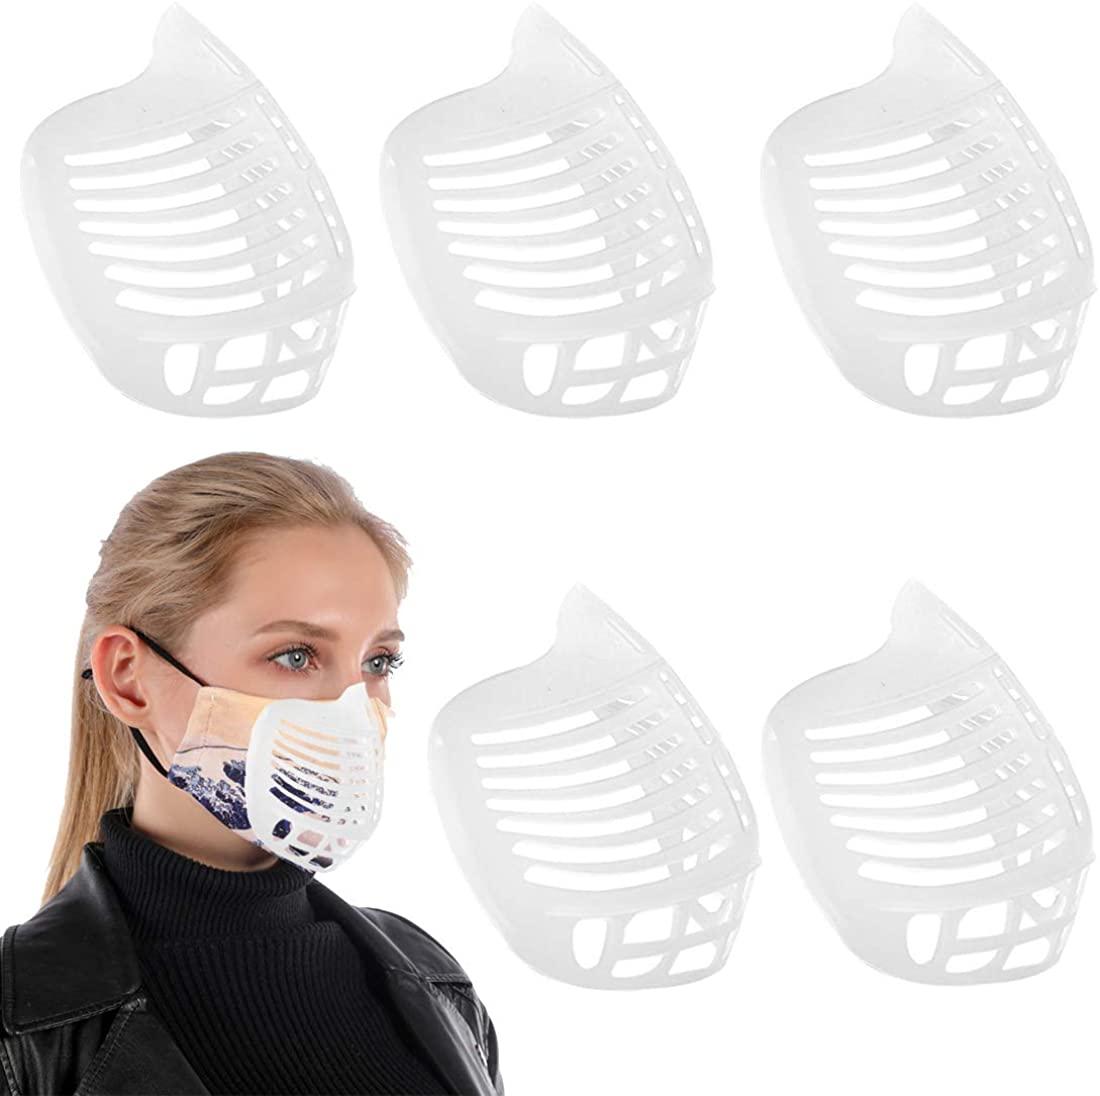 3D Odorless Mask Brackets Silicone Inner Support Frame Extenders for Comfortable Breathing